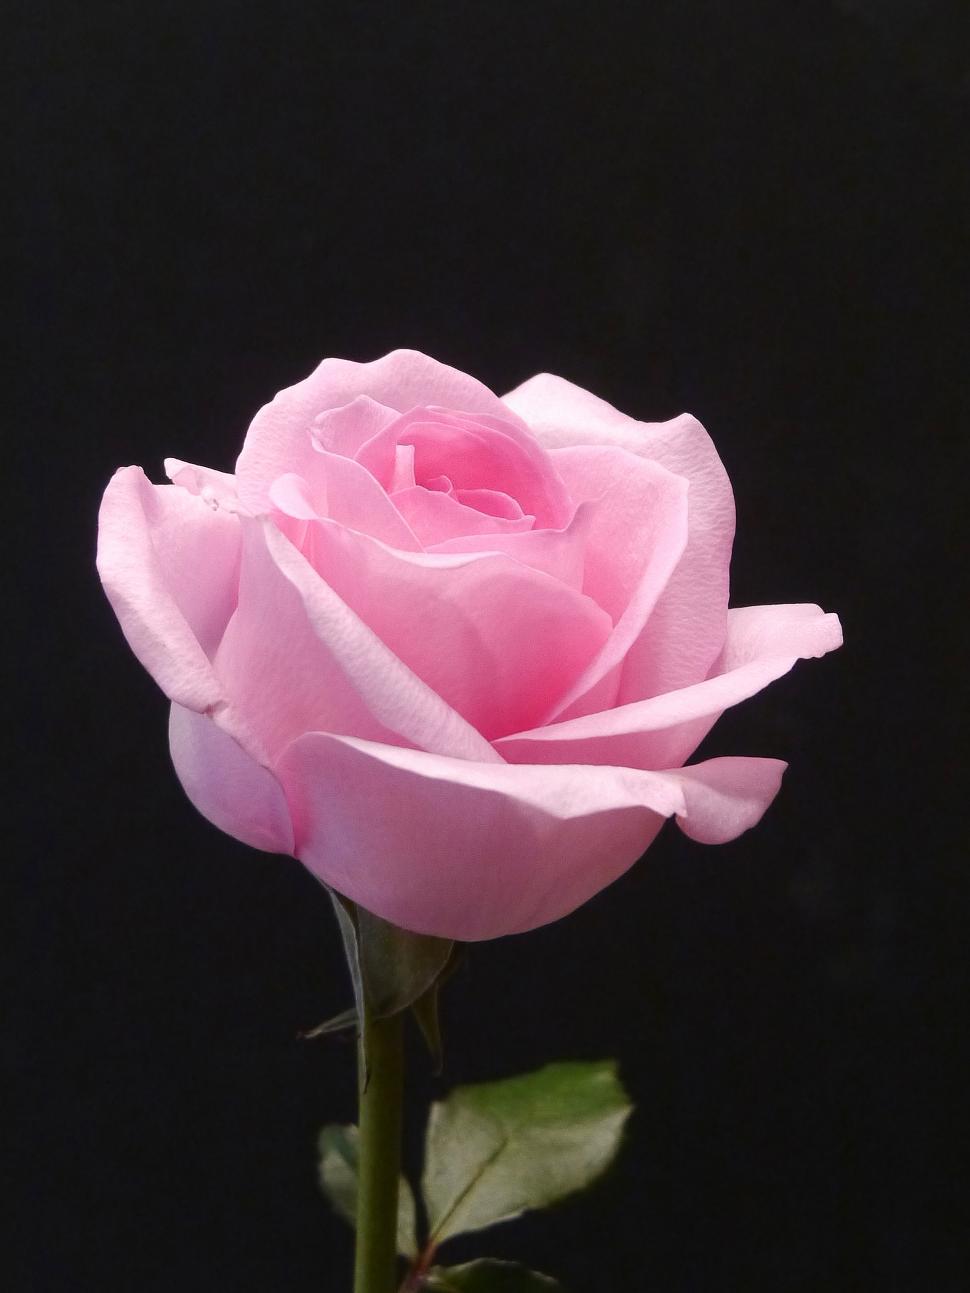 Download Free Stock Photo of Pink Rose on Black